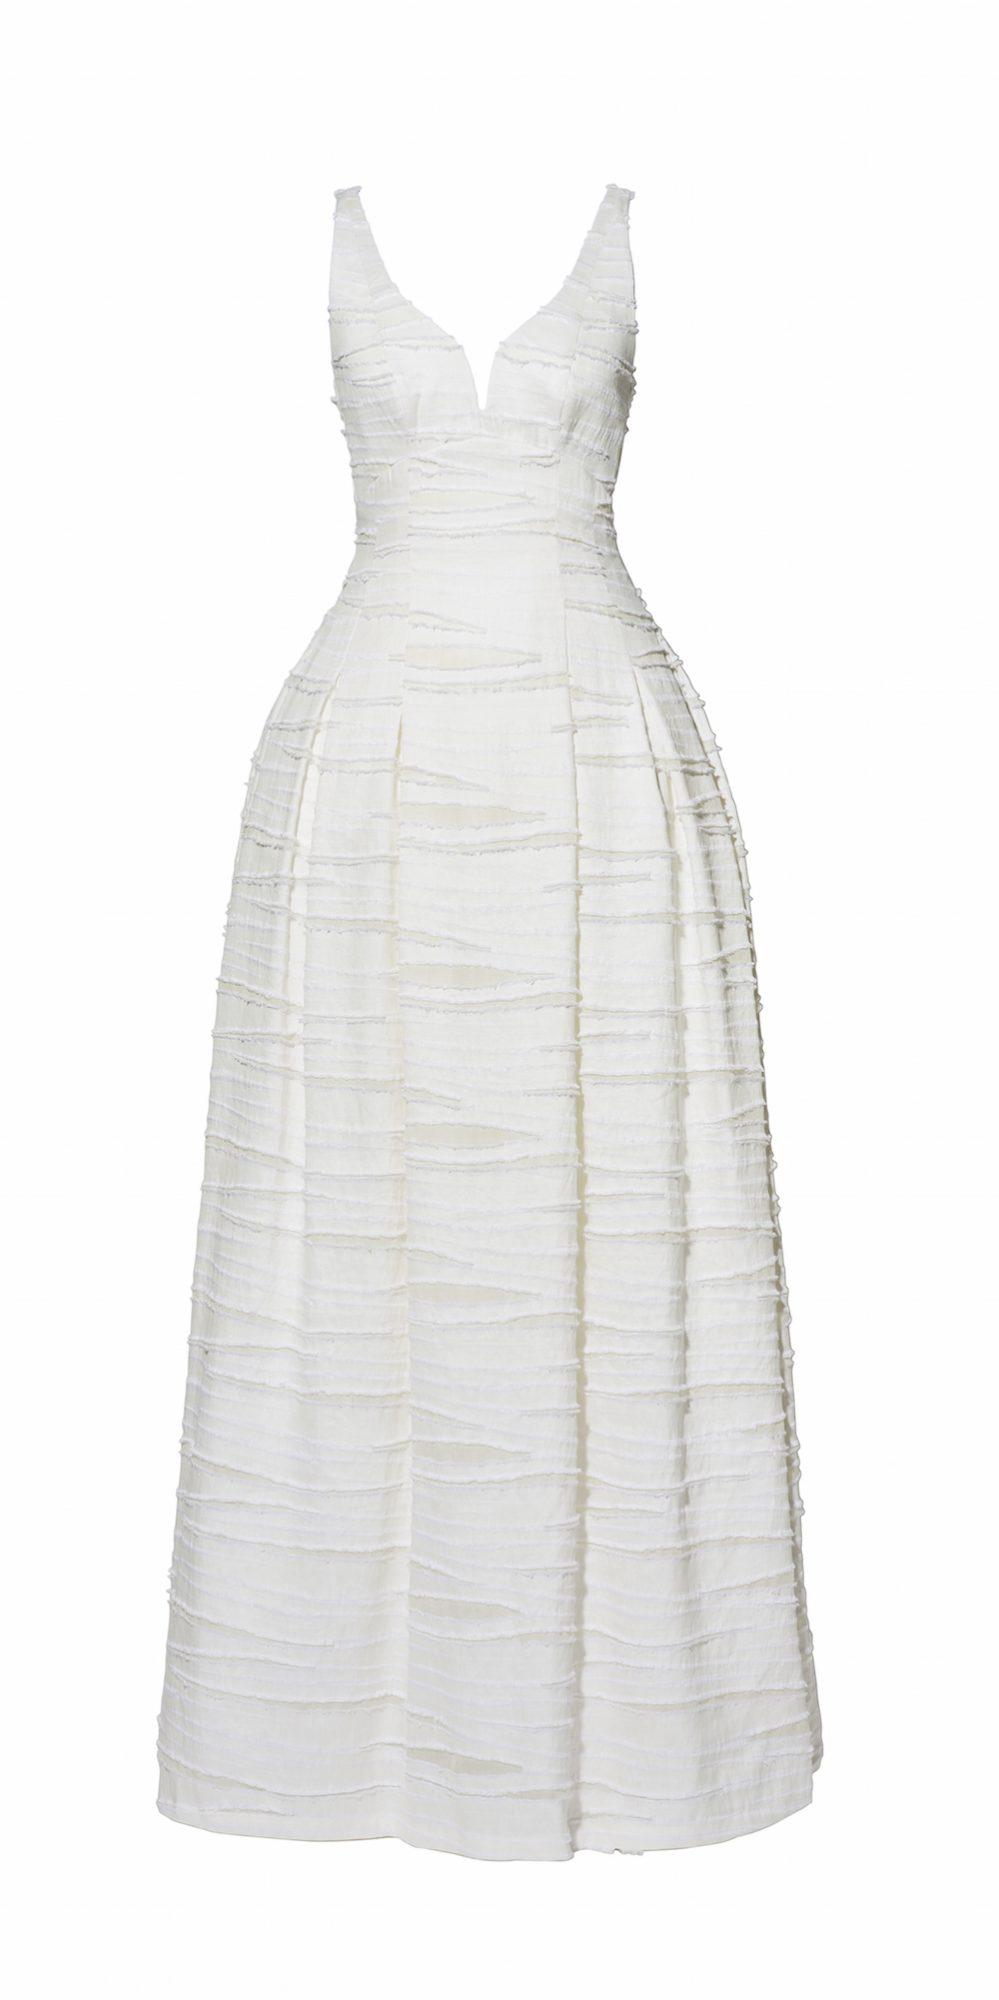 hm-wedding-gown-1.jpg